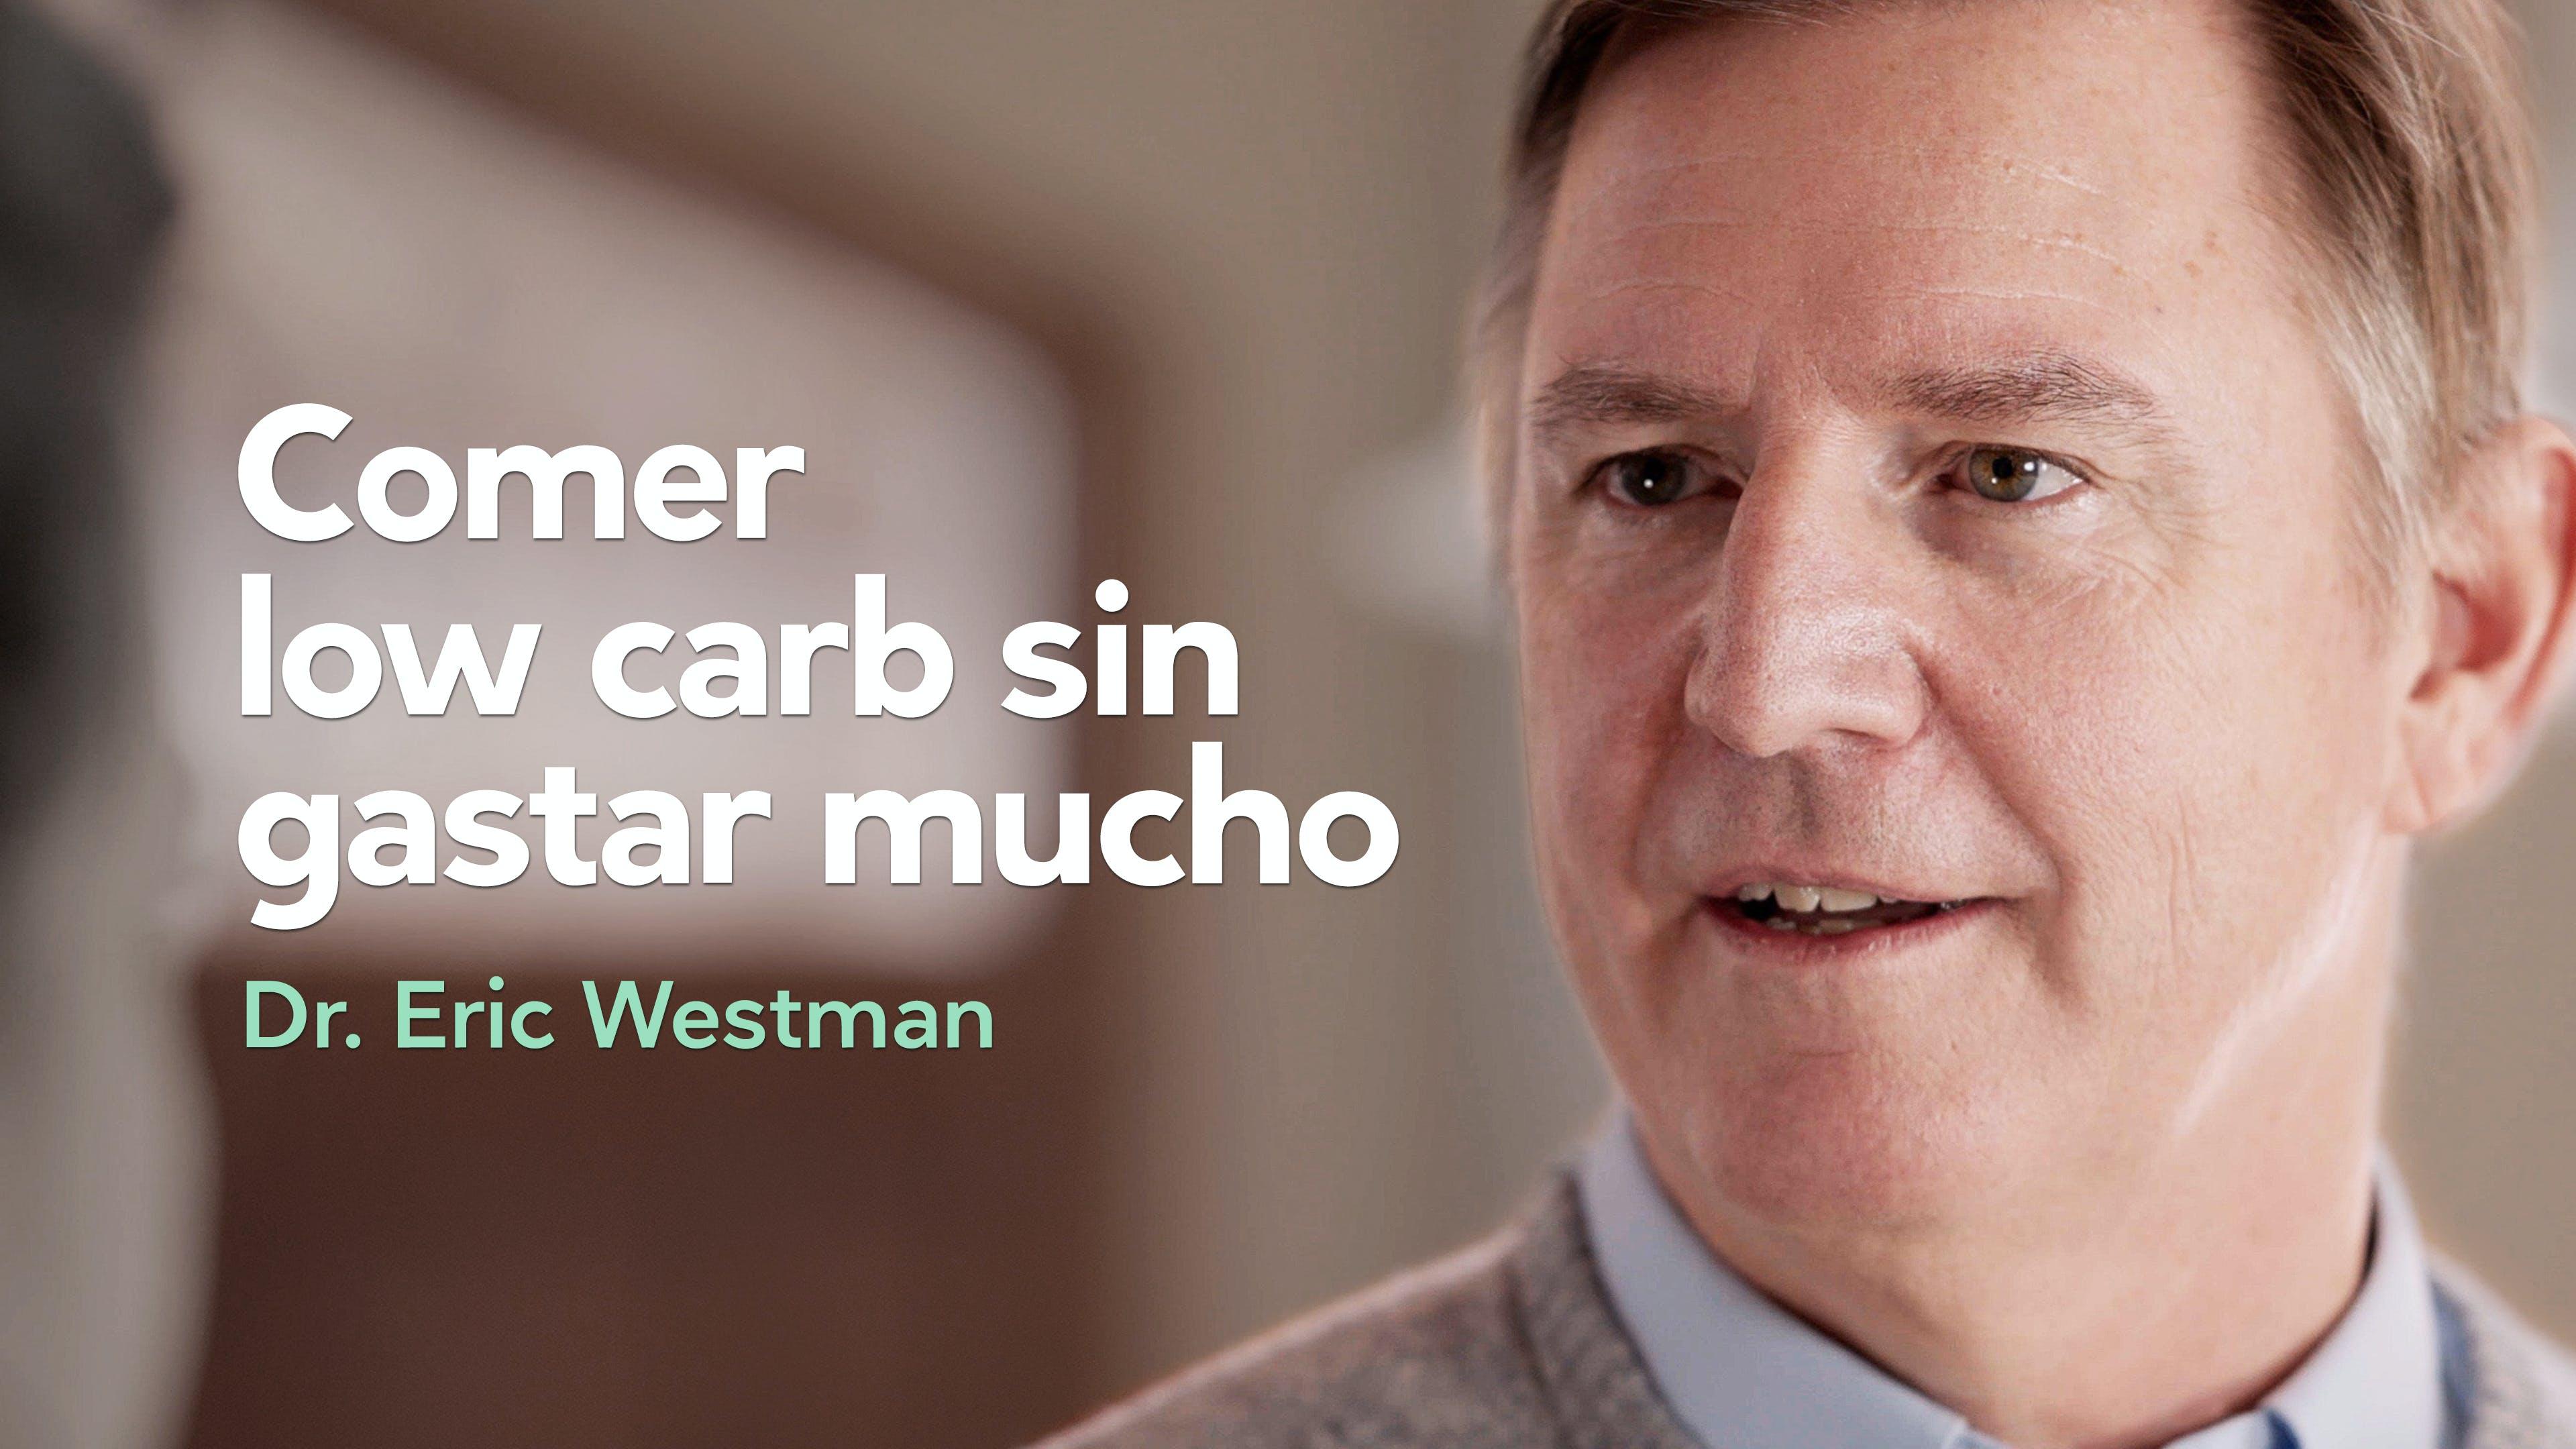 Comer low carb, sin gastar mucho - Dr. Eric Westman